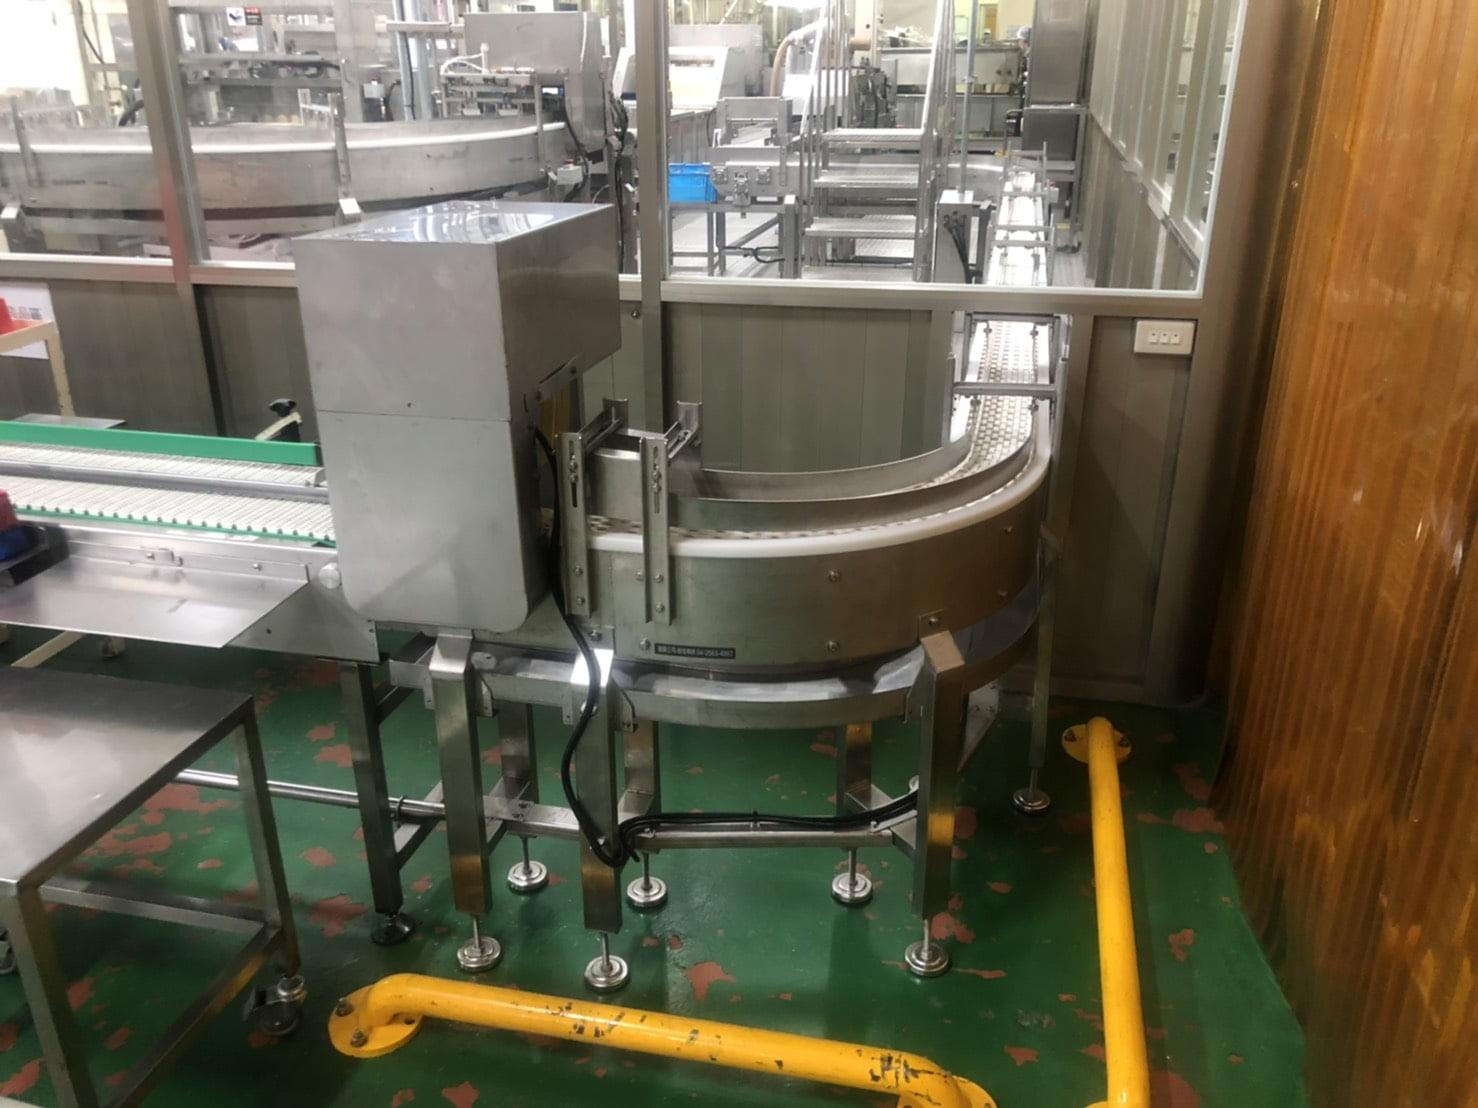 Automatic food cooling conveyor production line-Lichen Conveyor Equipment Co., Ltd.